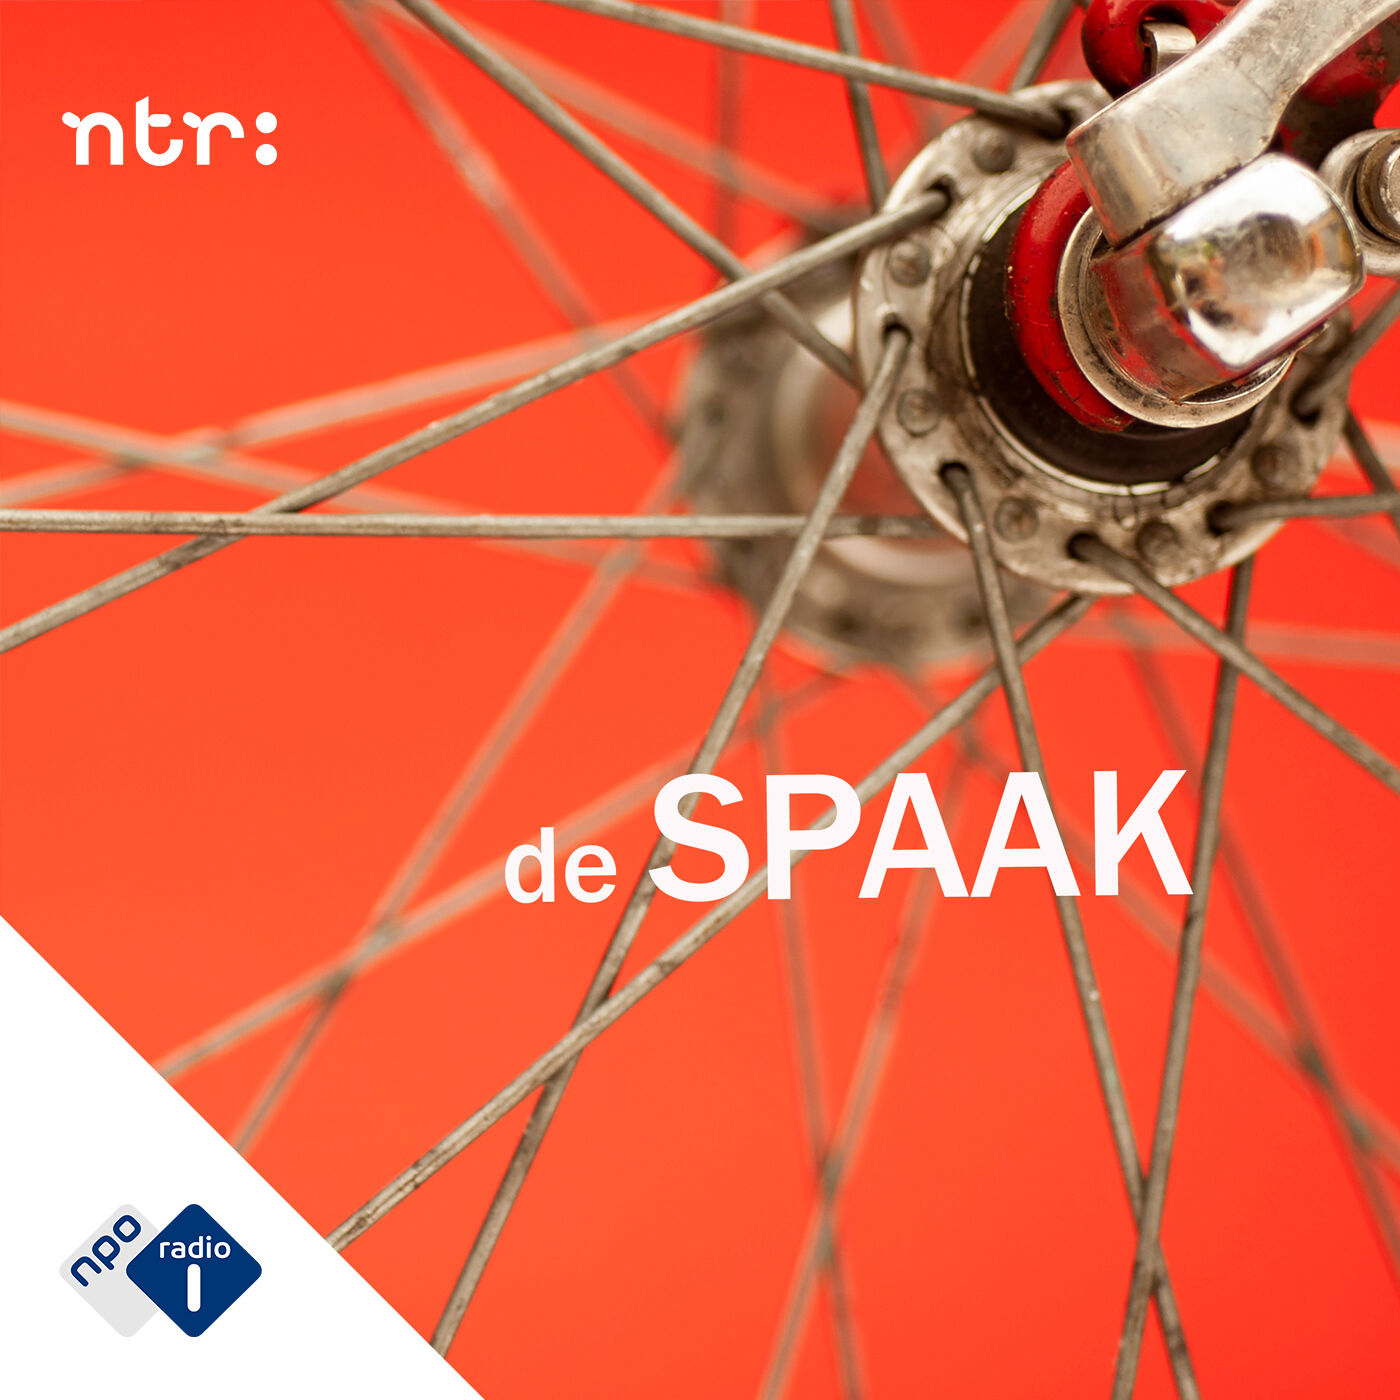 De Spaak logo